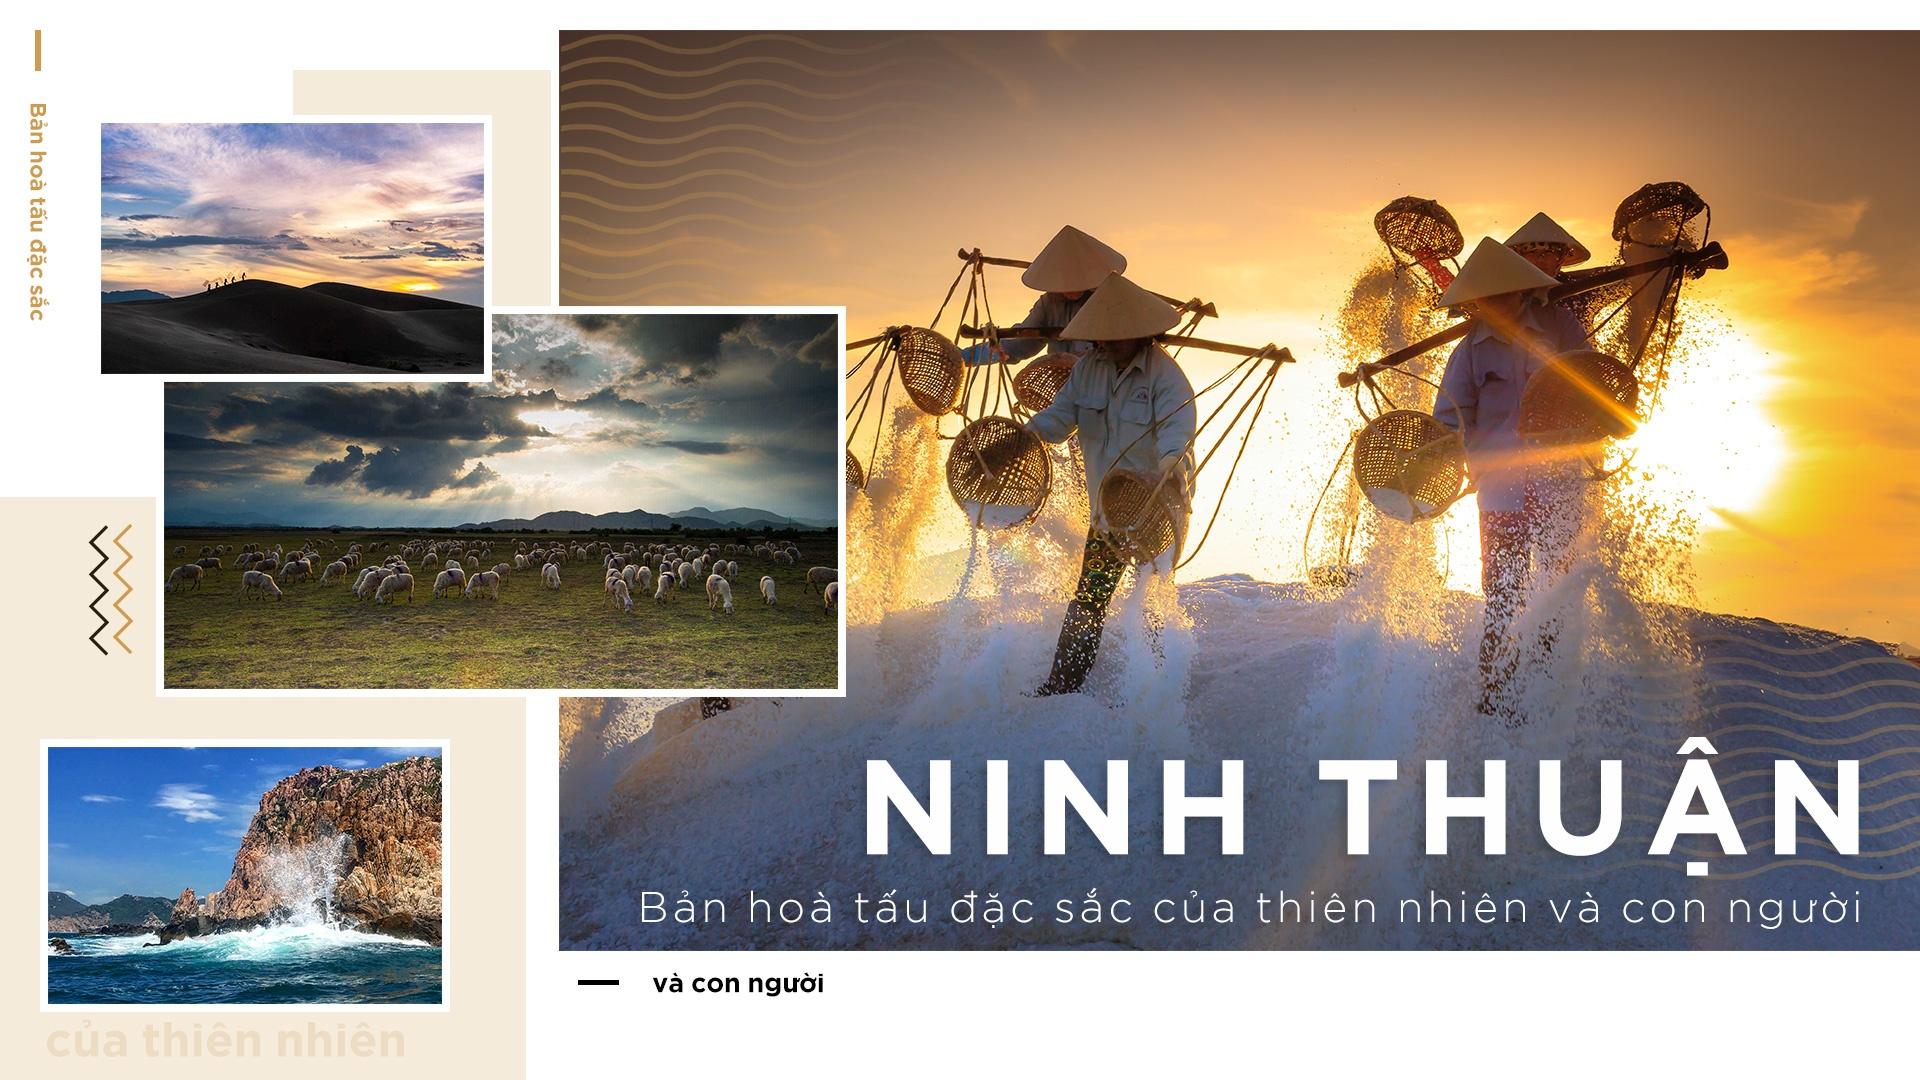 du lich Ninh Thuan anh 2